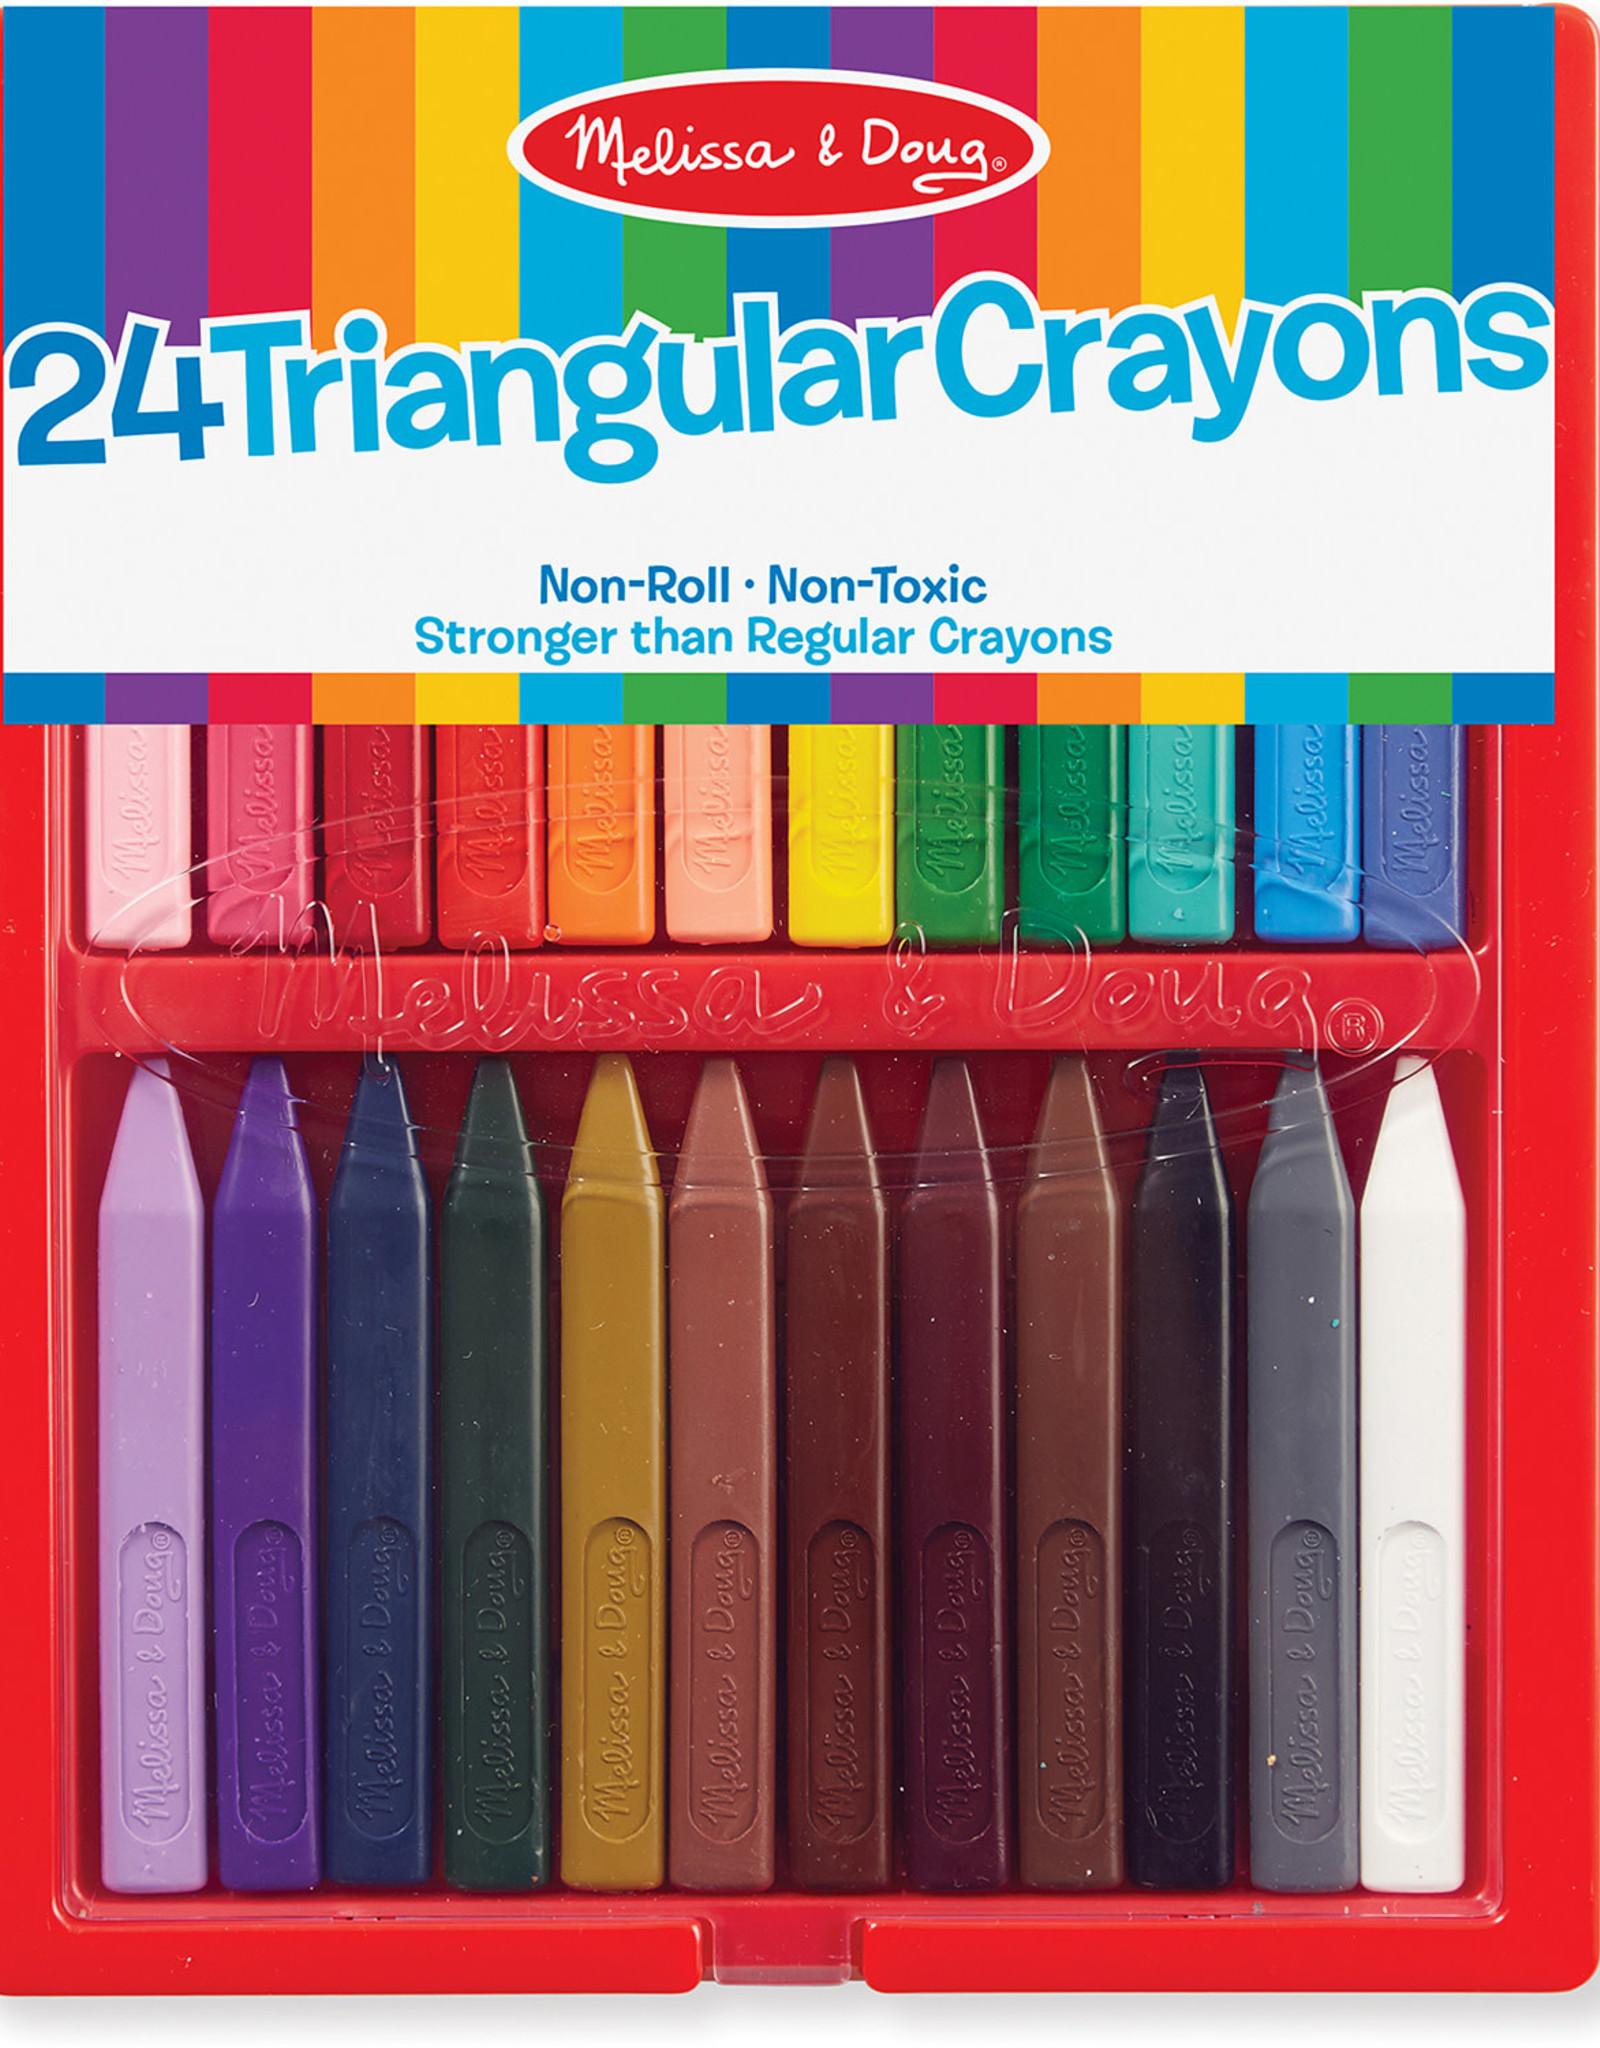 Melissa & Doug Melissa & Doug 24 Triangular Crayon Set